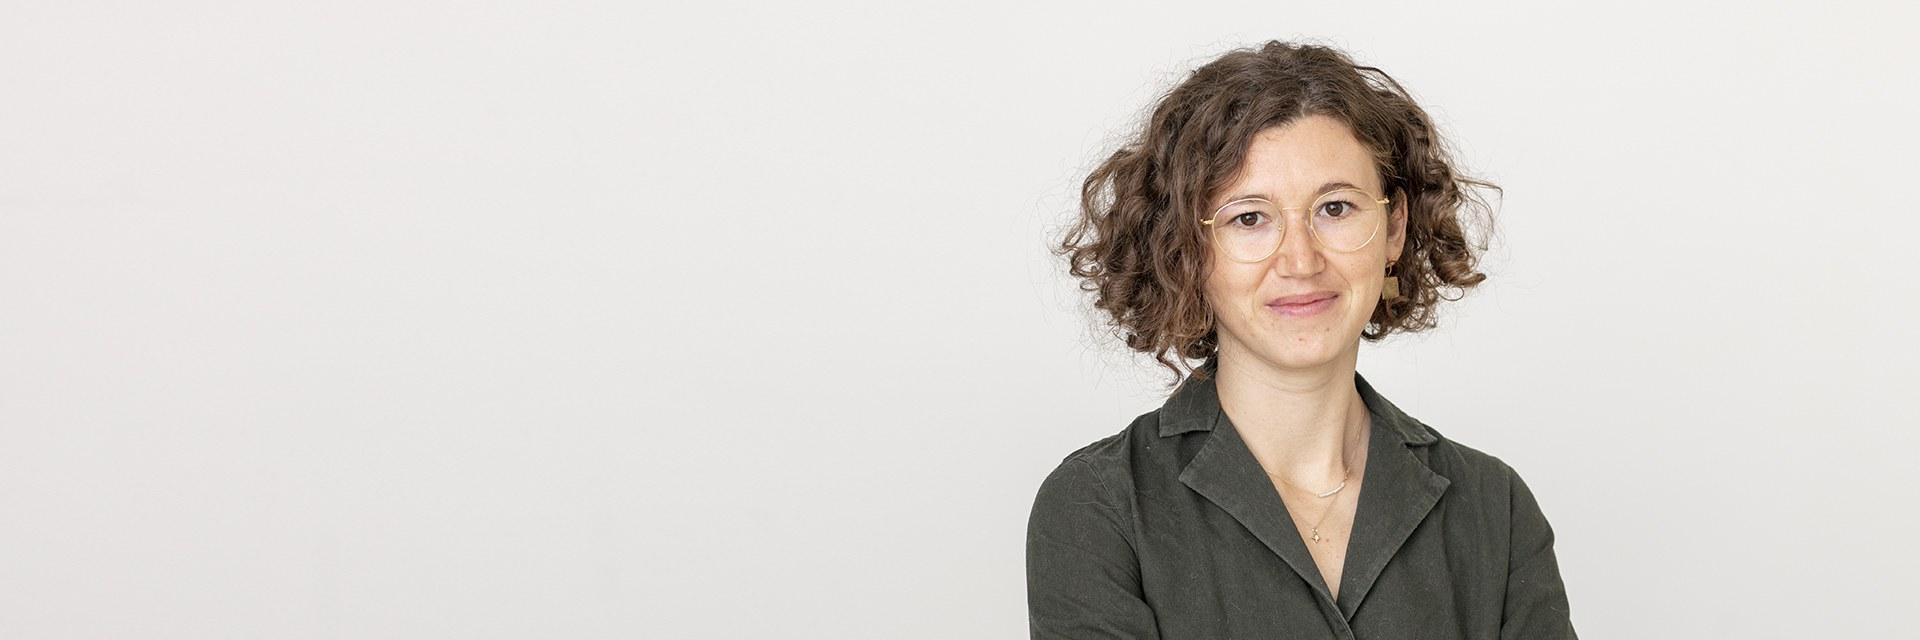 Christina Haas